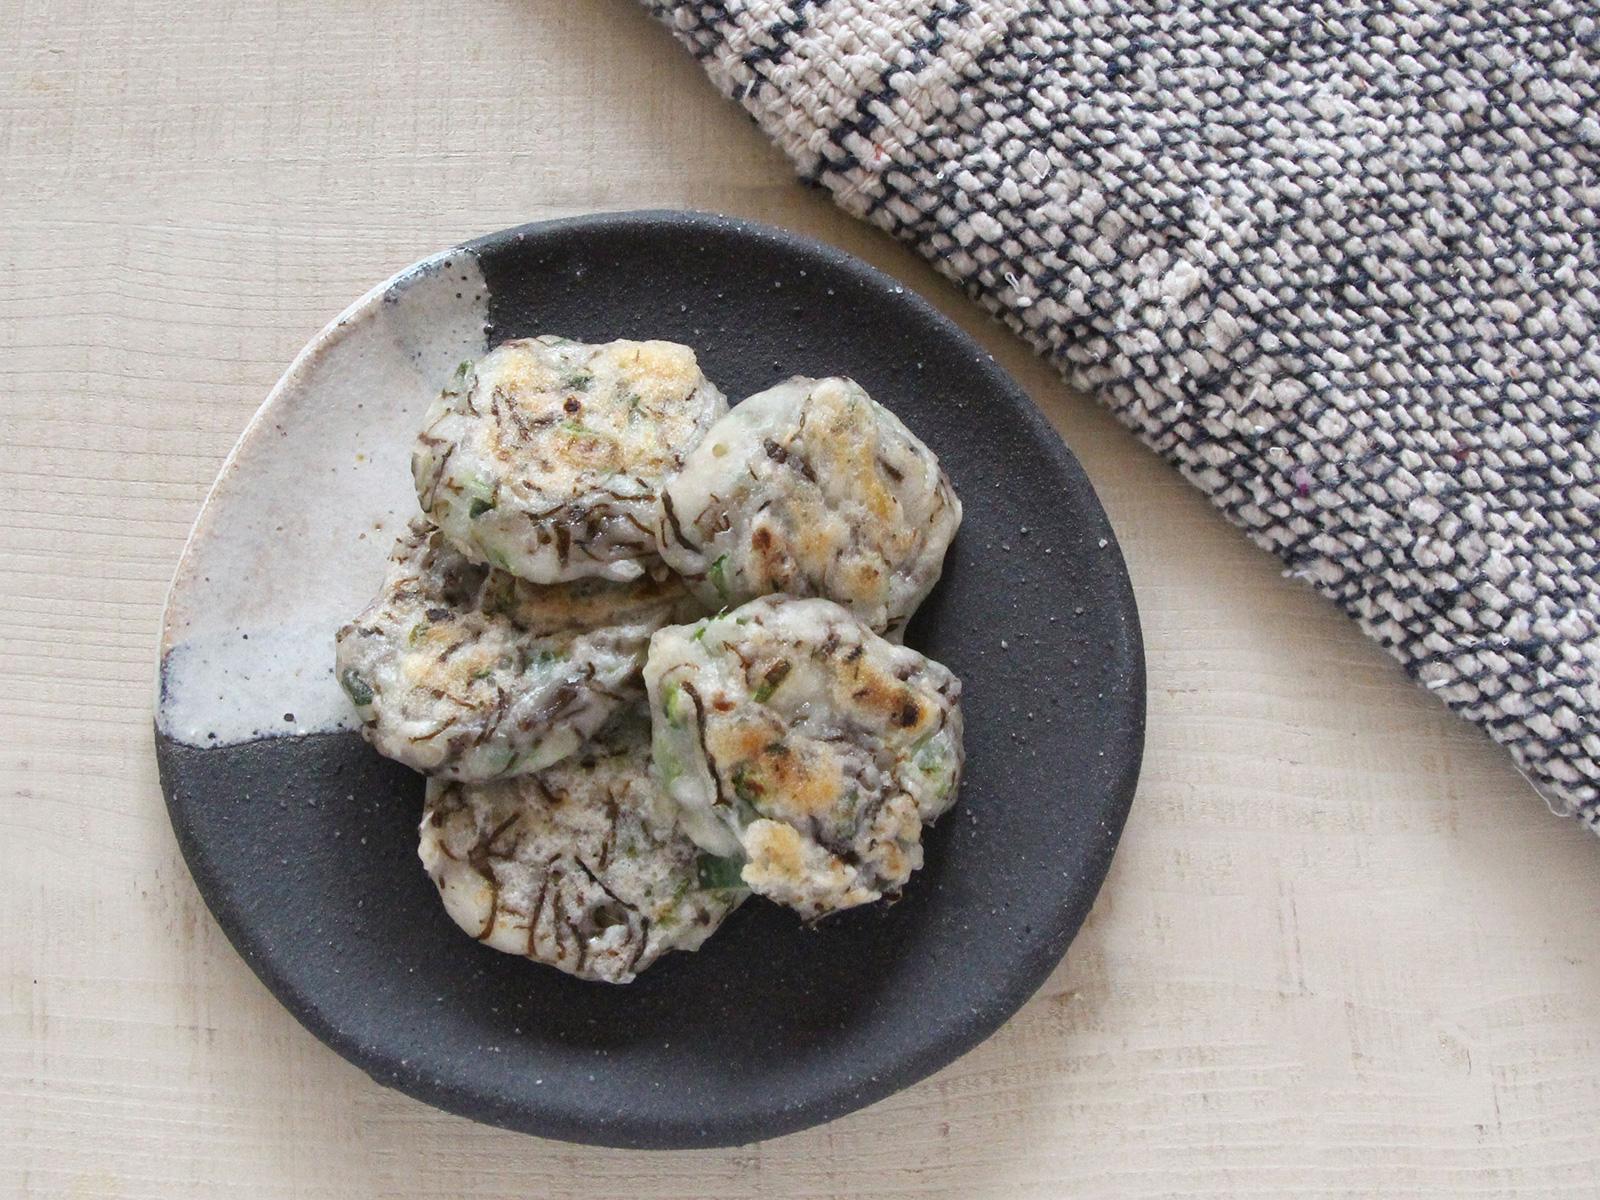 mogcookの離乳食レシピ 魚とオクラのもずく焼き